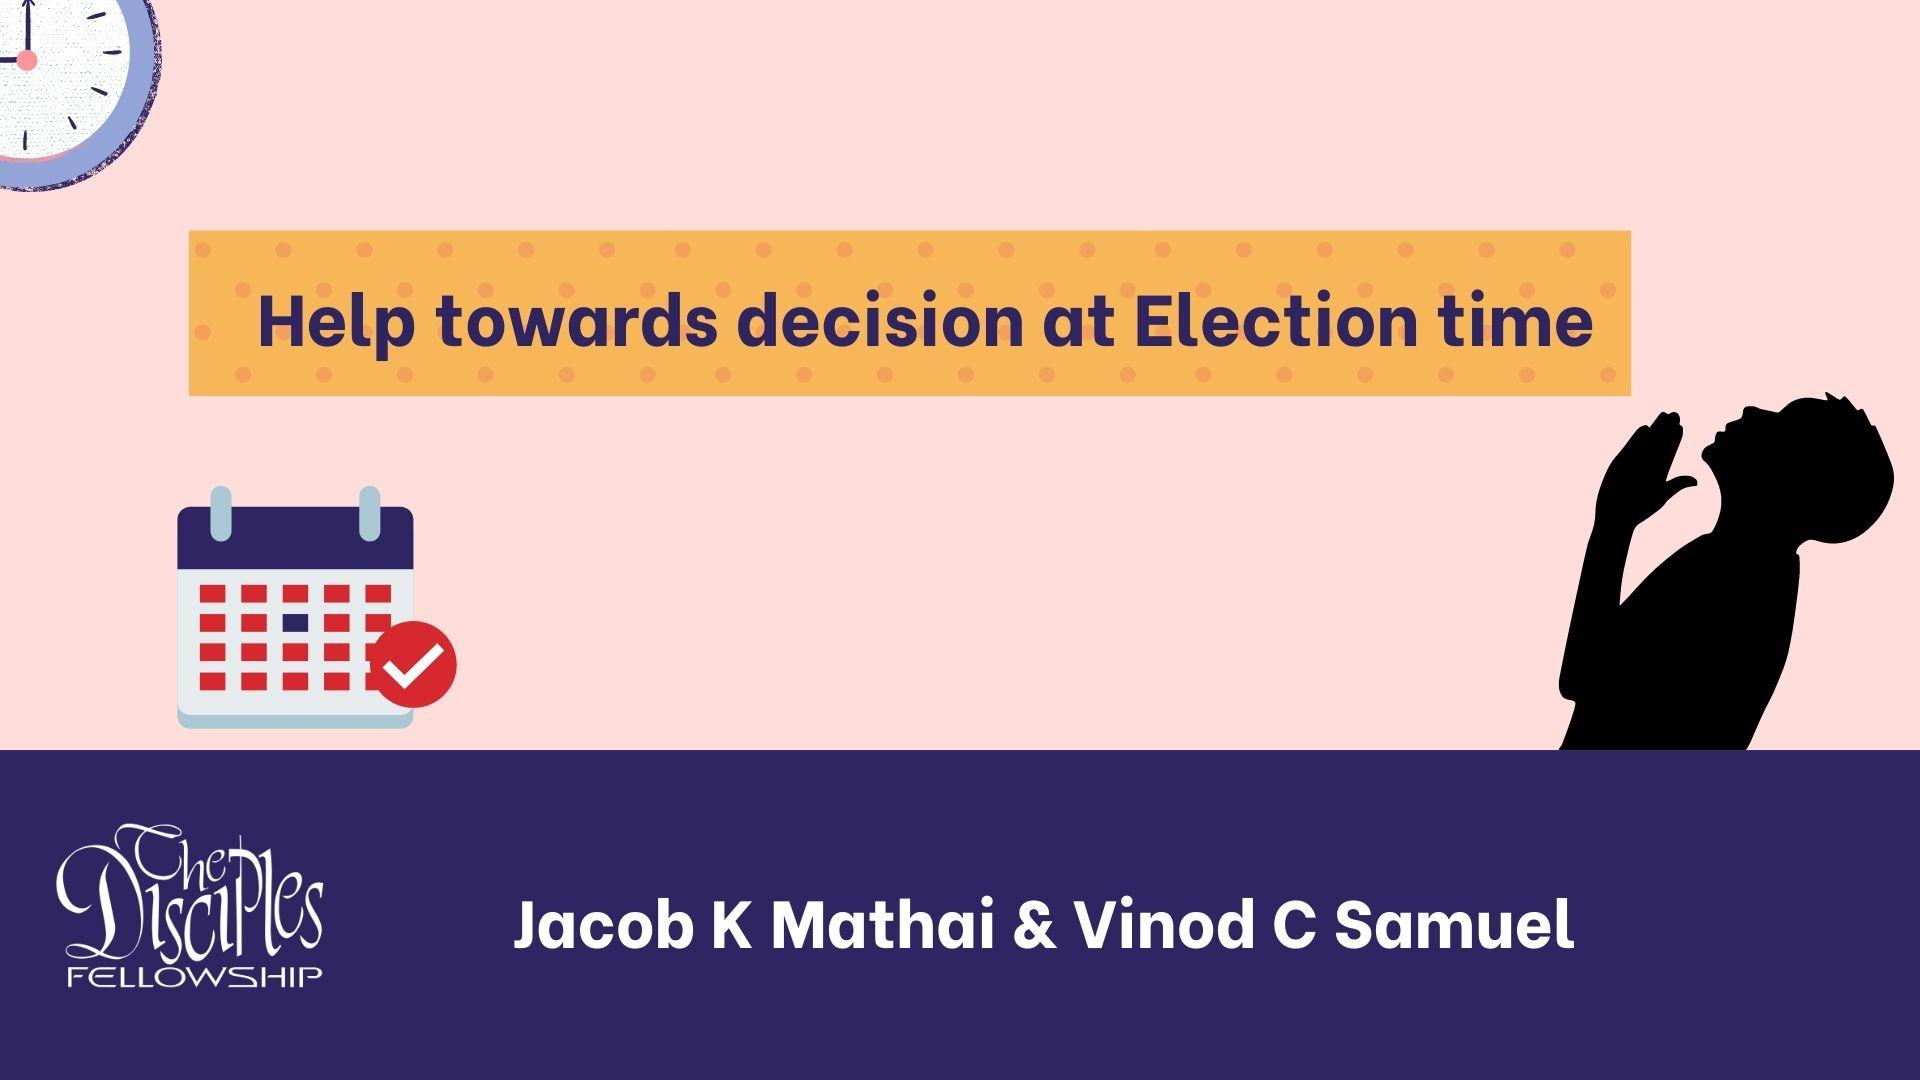 Help towards decision at Election time <br/> Jacob K Mathai & Vinod C Samuel